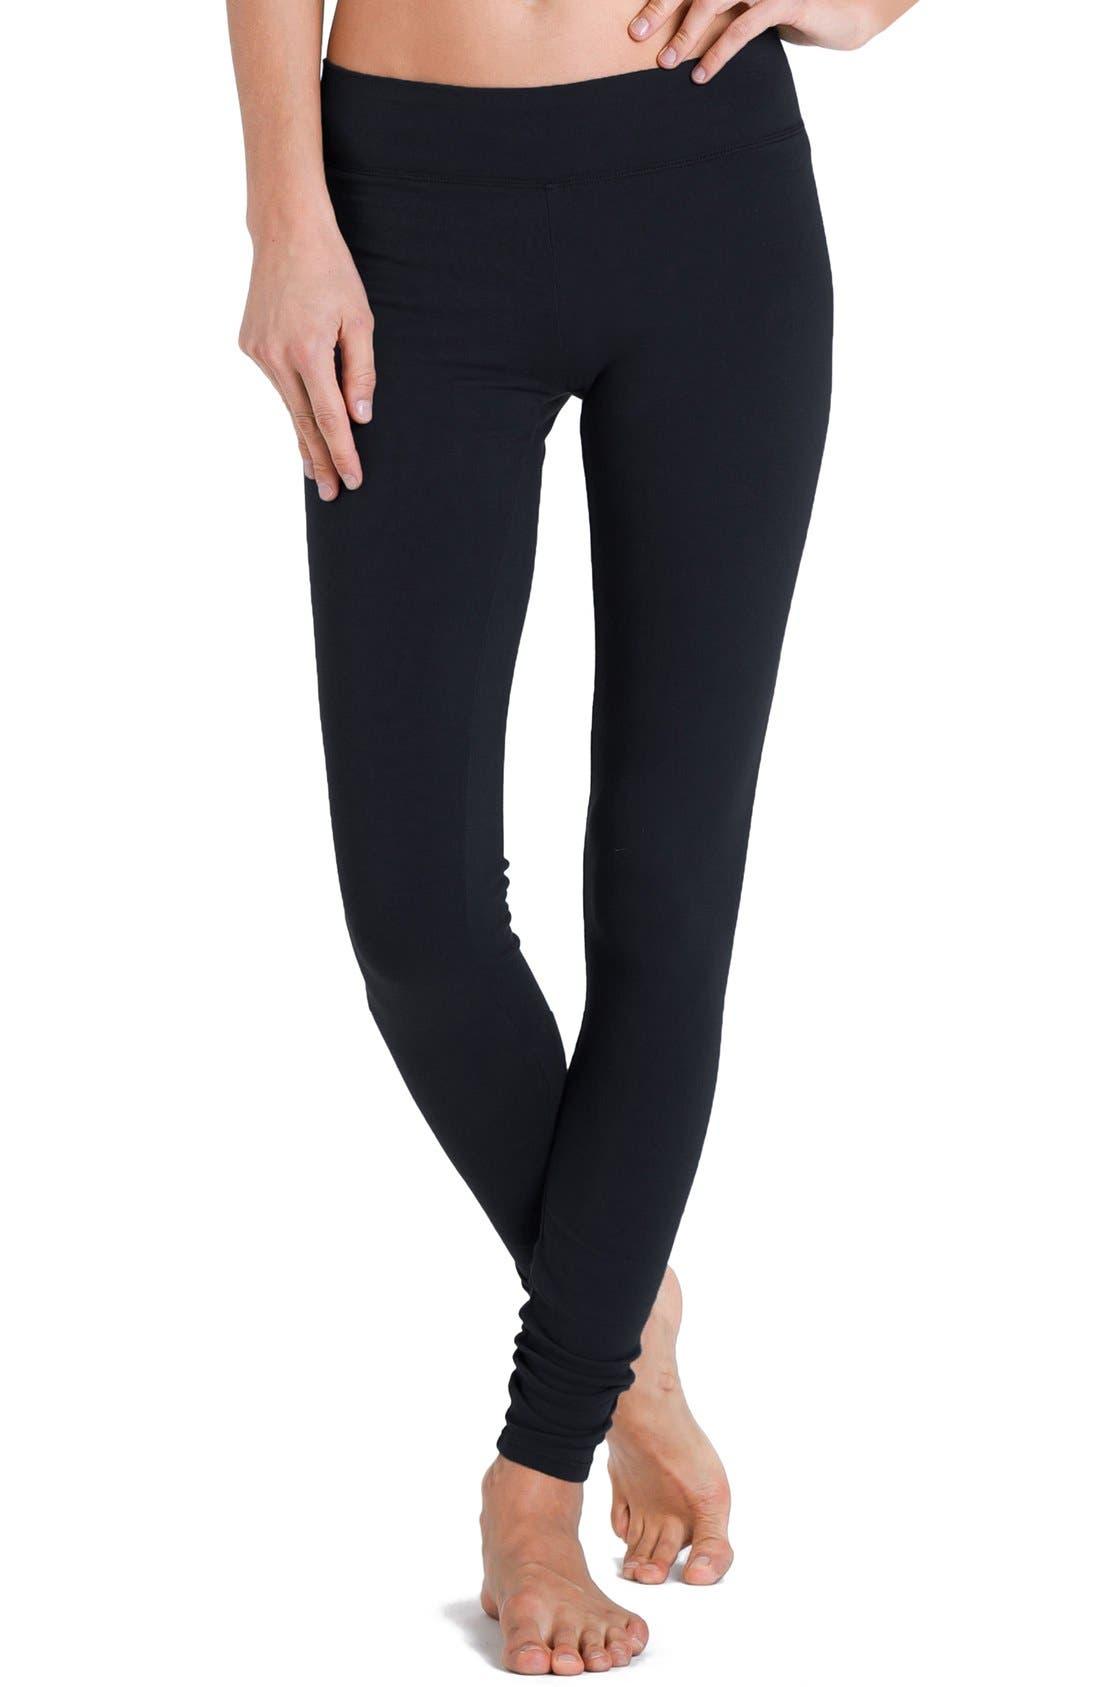 Flat Waistband Leggings,                         Main,                         color, Black